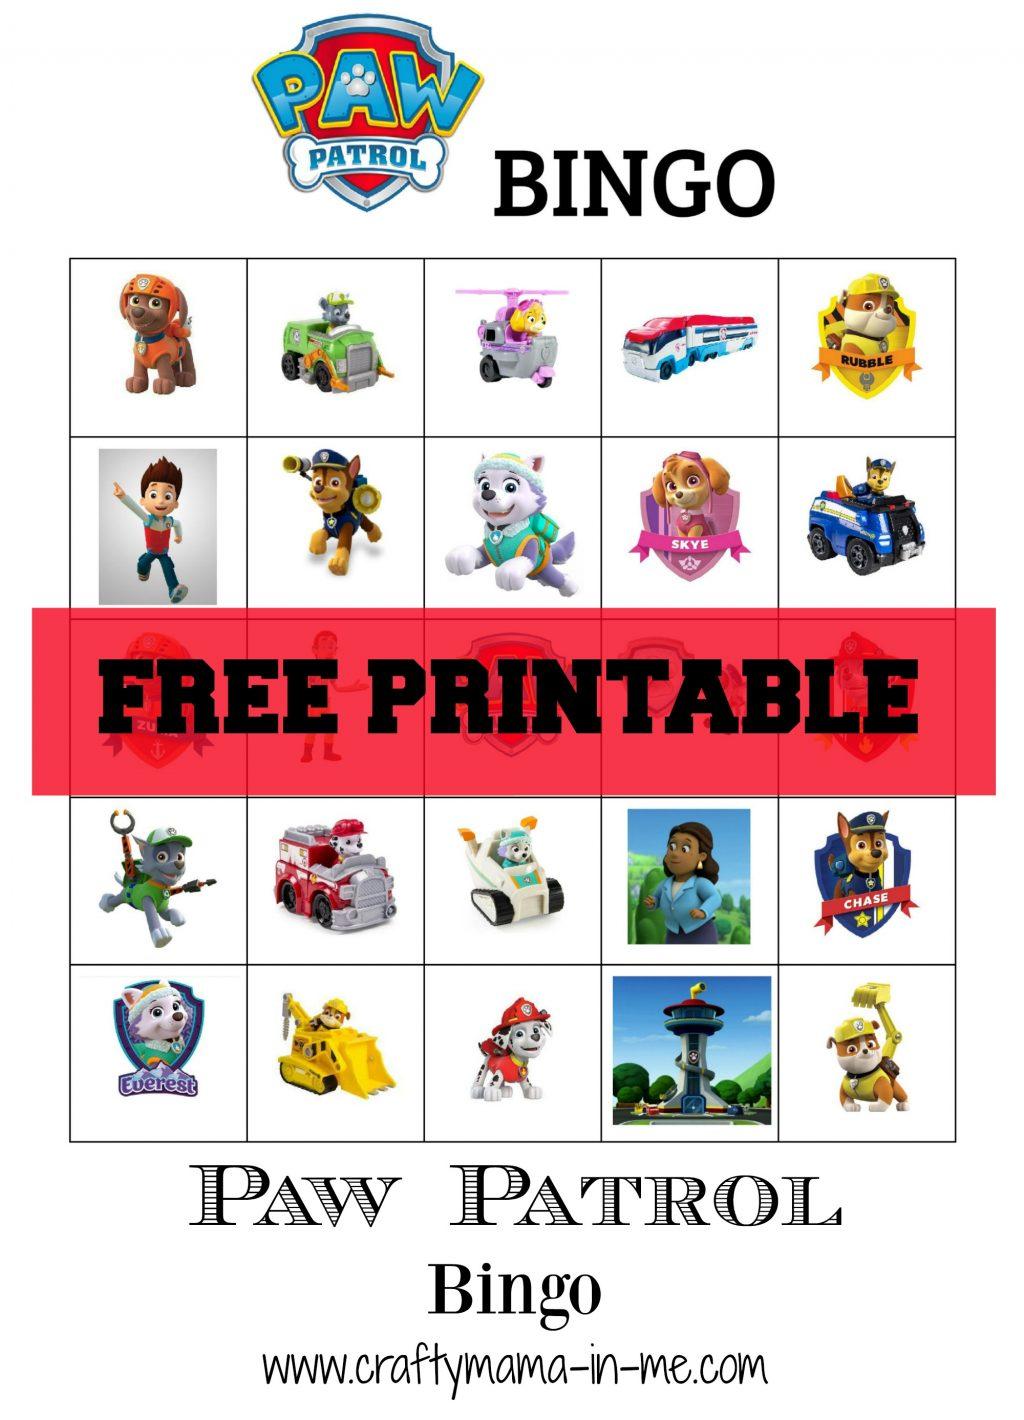 Free Printable Paw Patrol Bingo